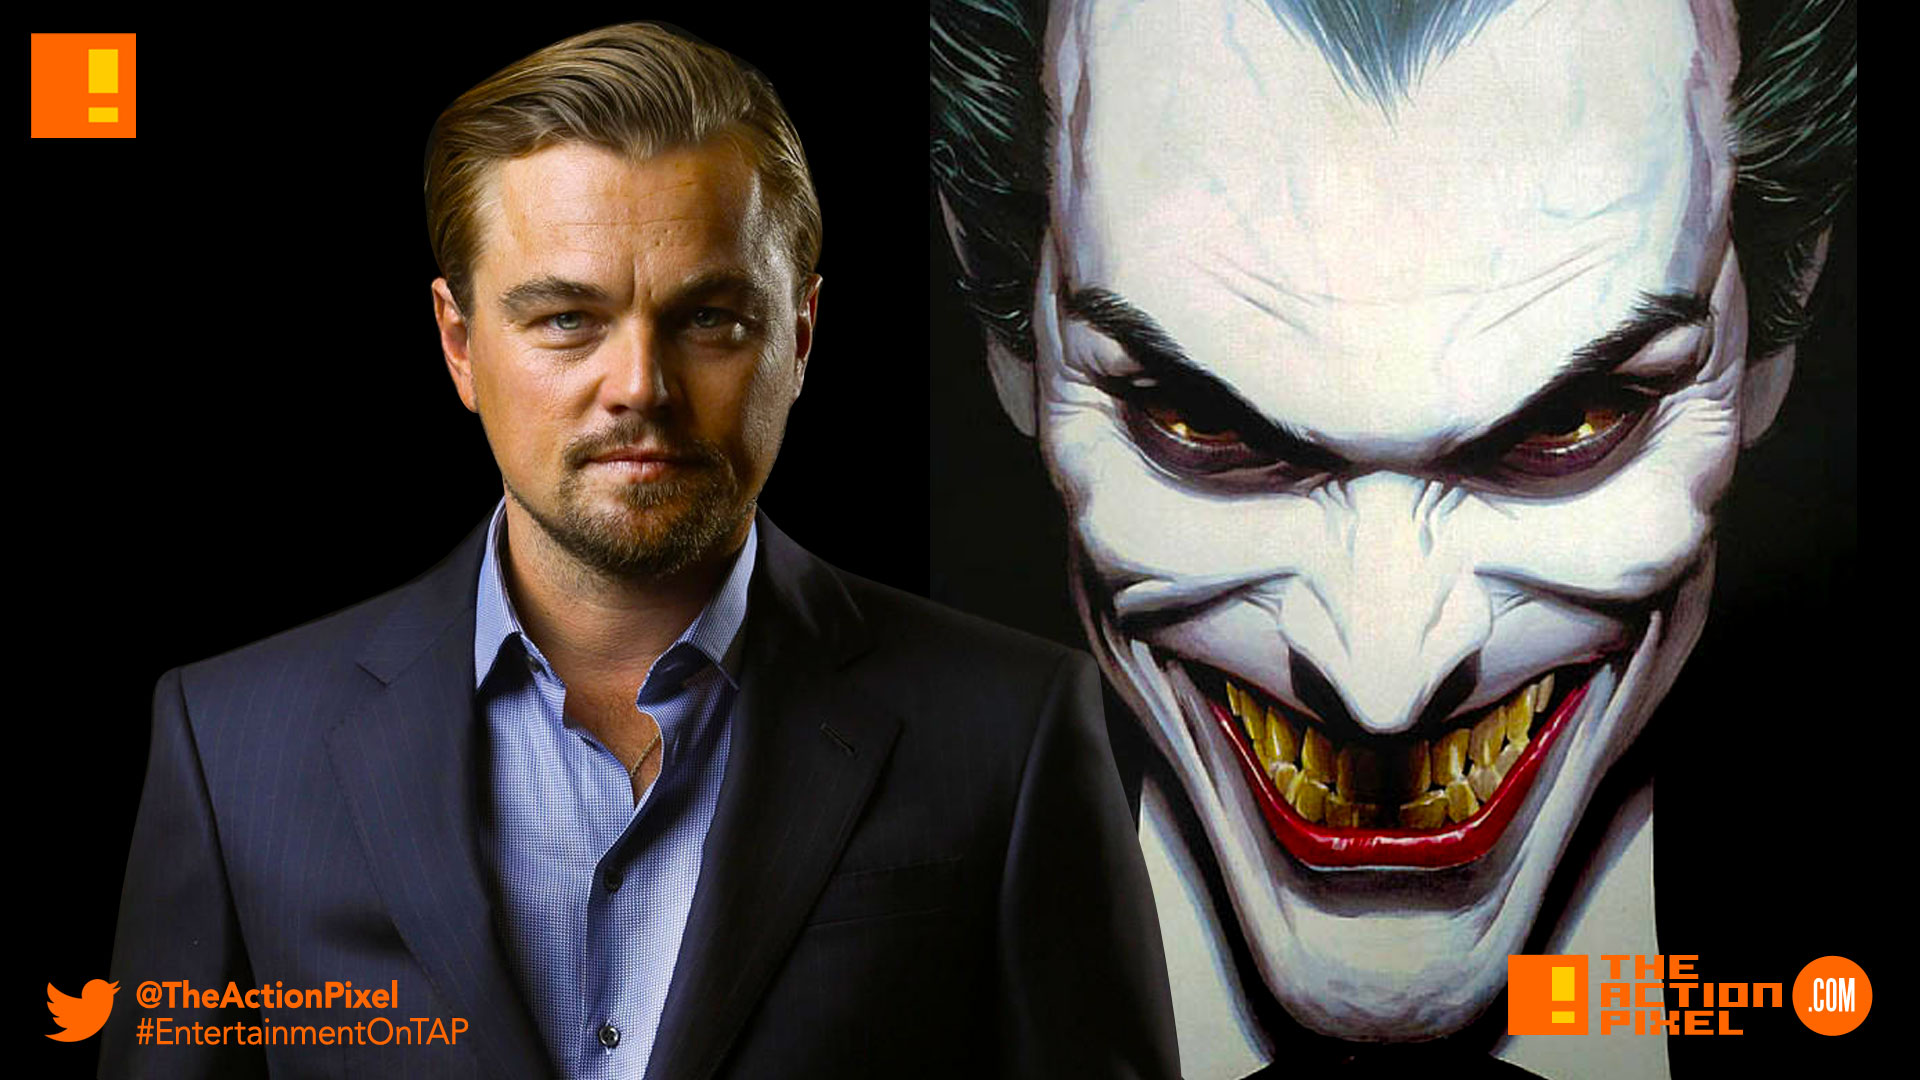 leonardo dicaprio, Joker, joker origins movie, joker, dc comics, the action pixel, entertainment on tap, batman ,dc comics, warner bros pictures, martin scorcese, jared leto,